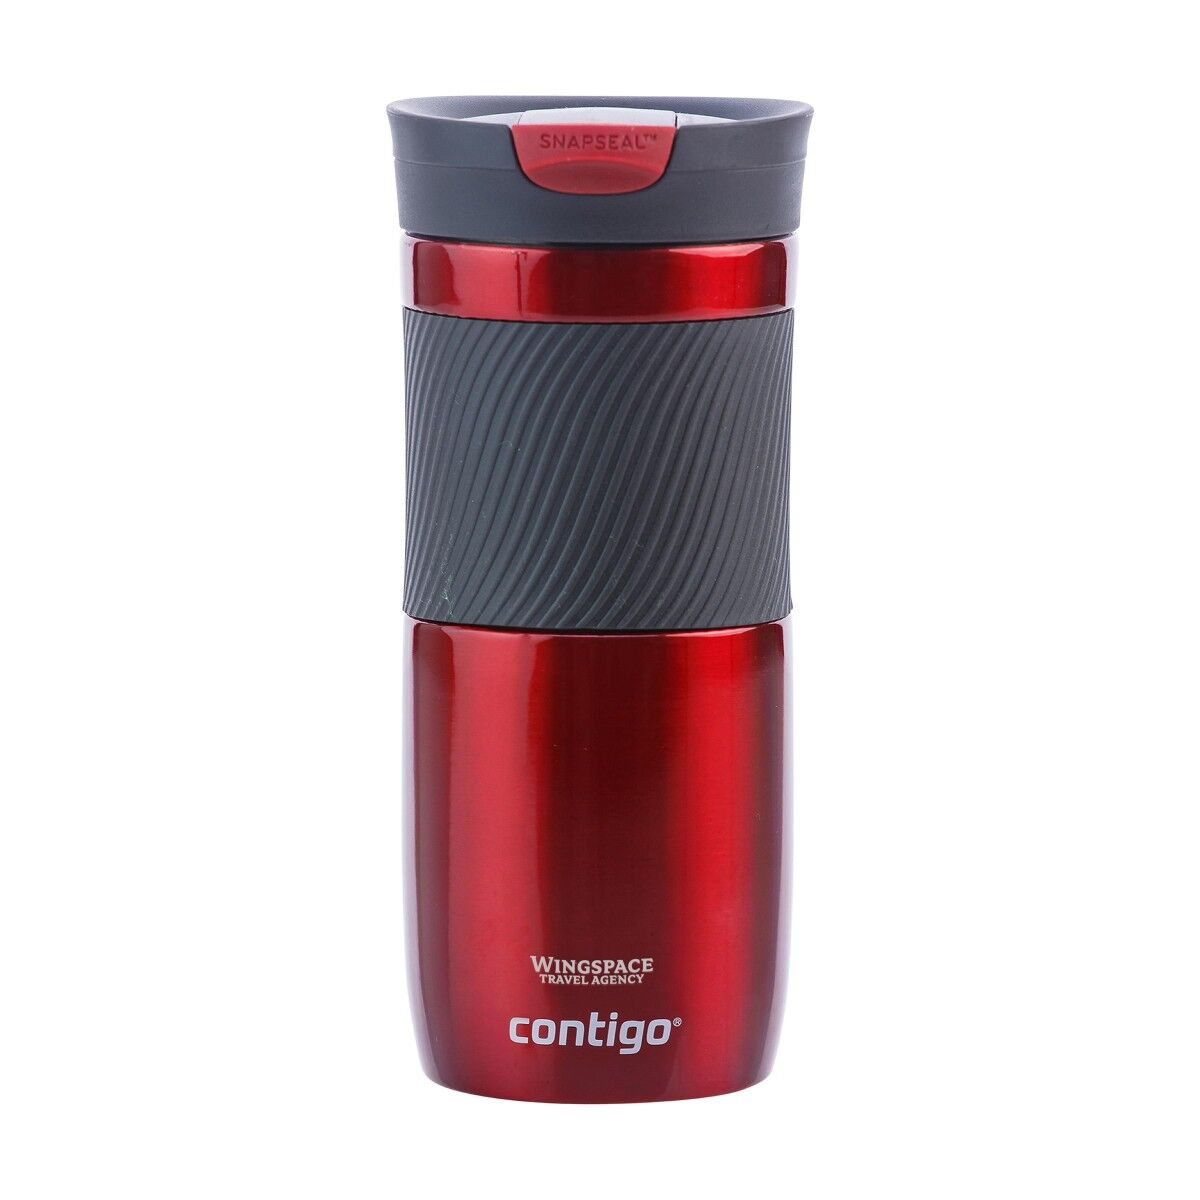 Contigo Byron Thermal Mug in Red